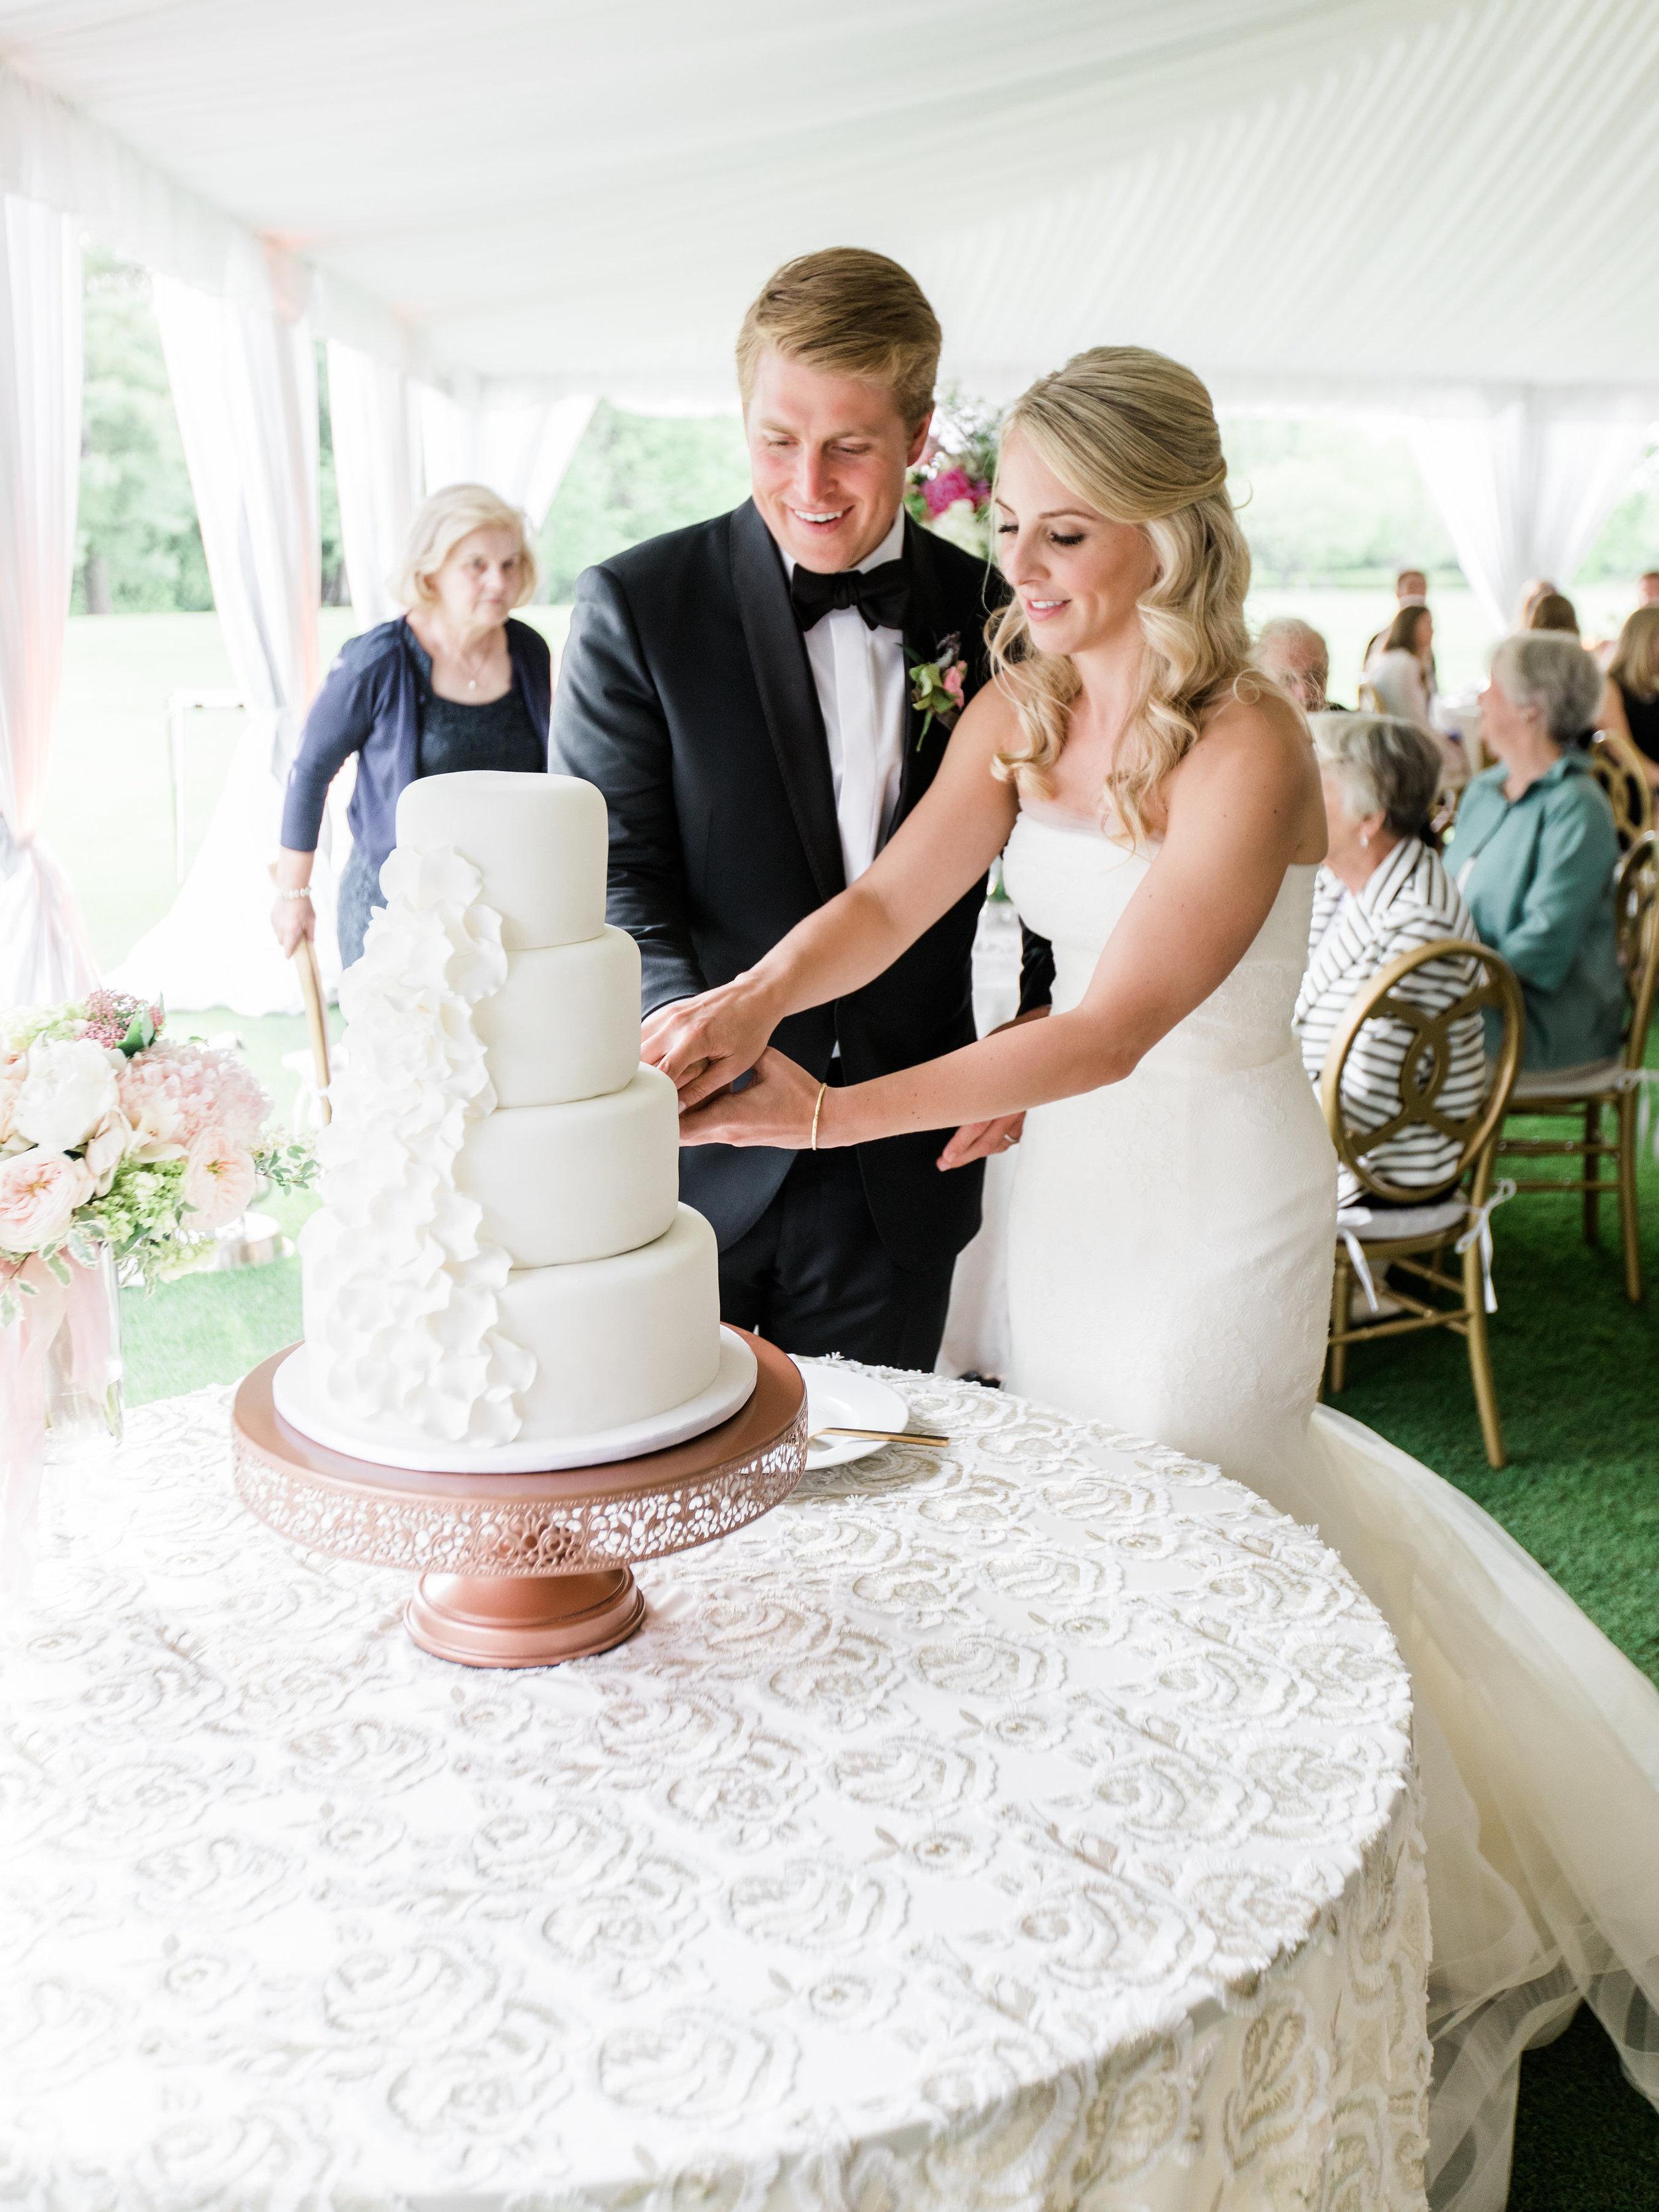 Coffman+Wedding+Reception-21.jpg